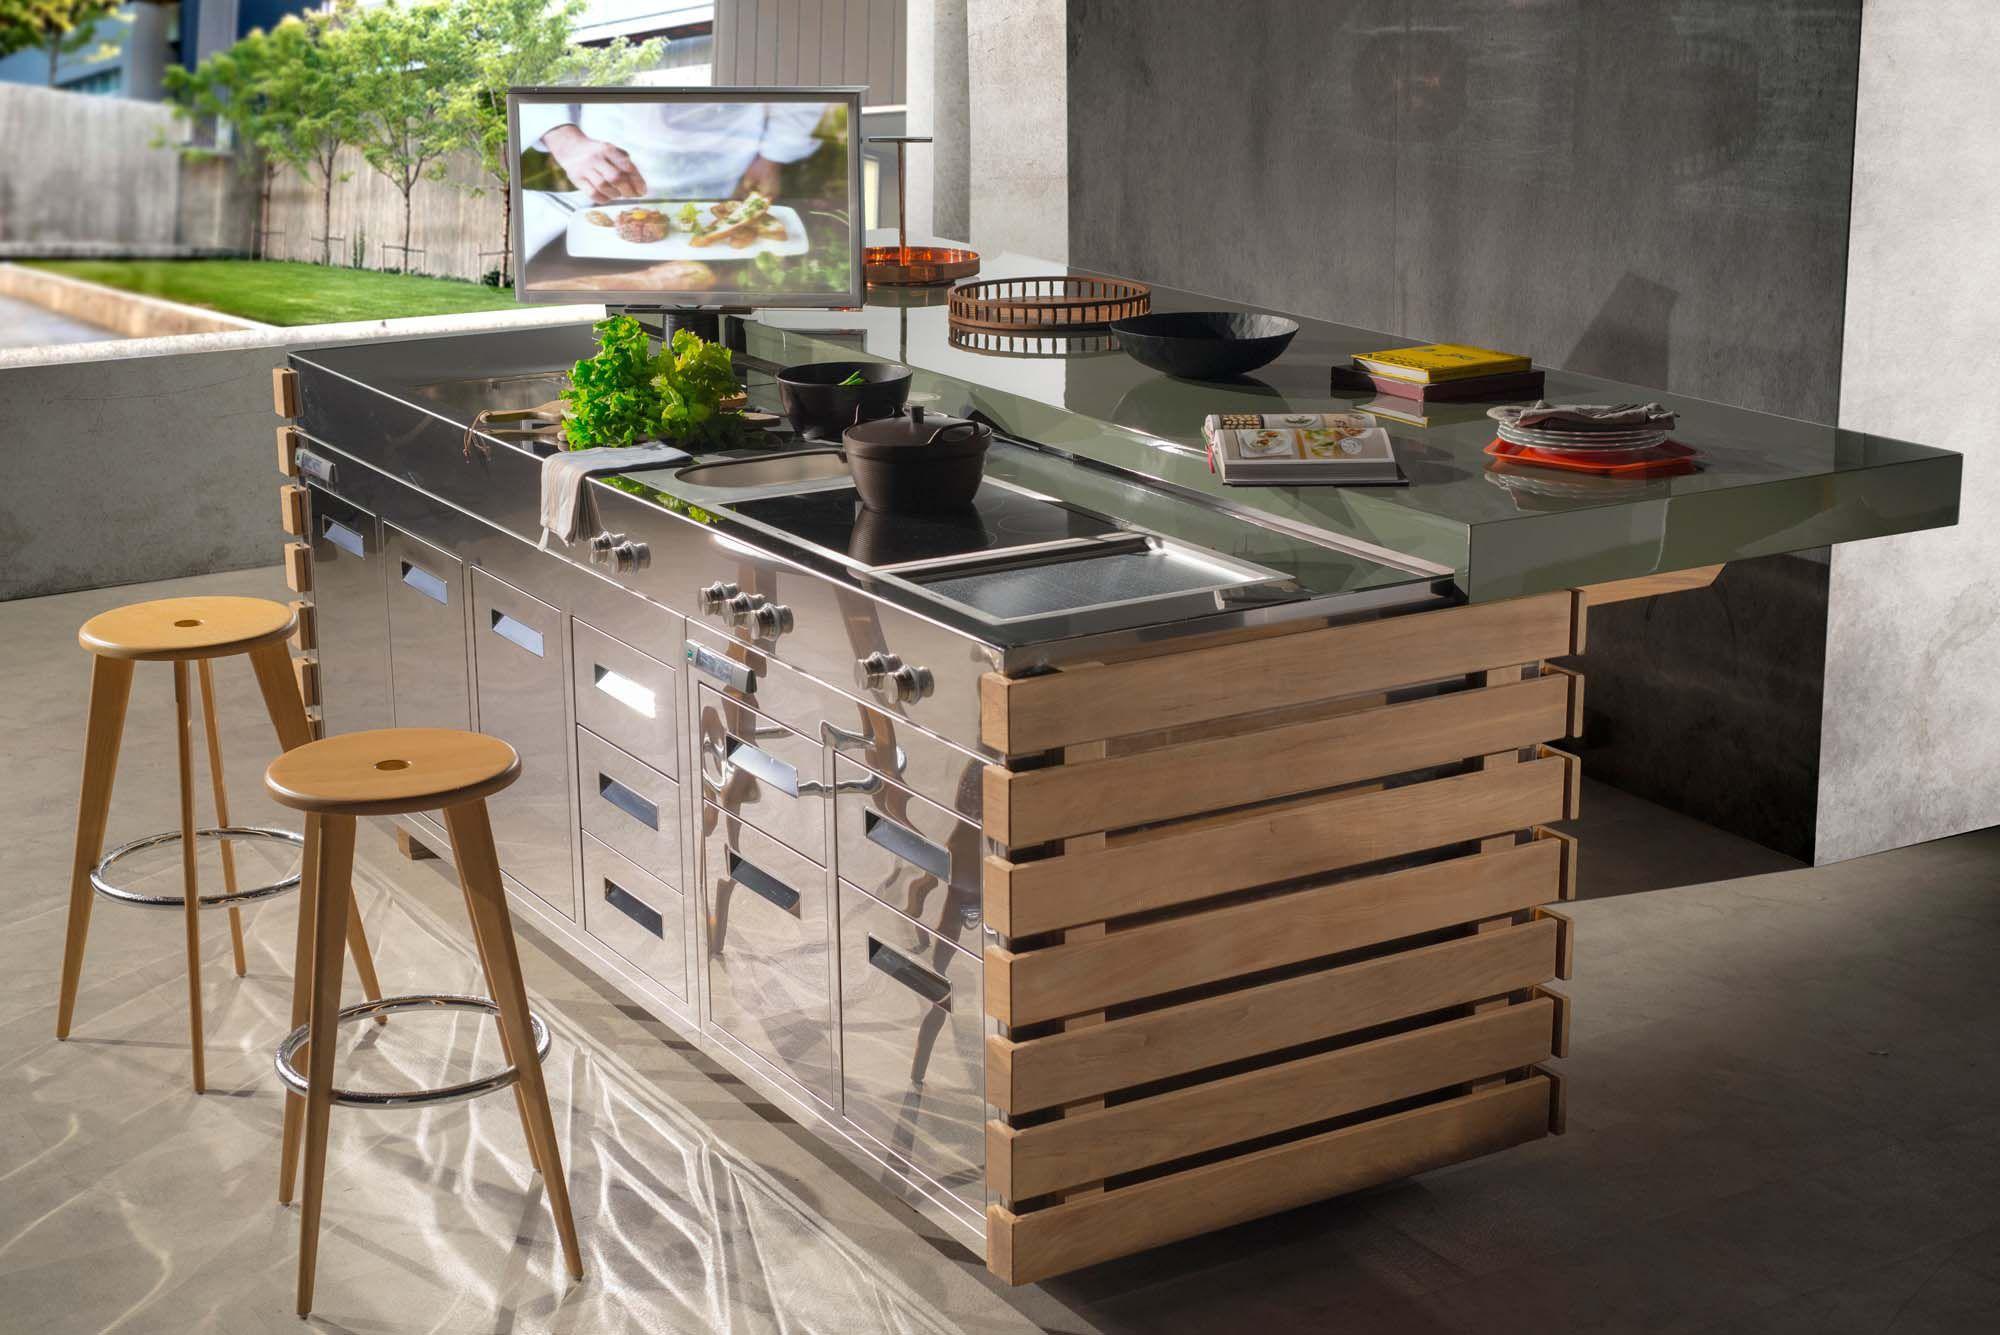 Cocina moderna / de acero inoxidable / de fibra de vidrio / con isla ...